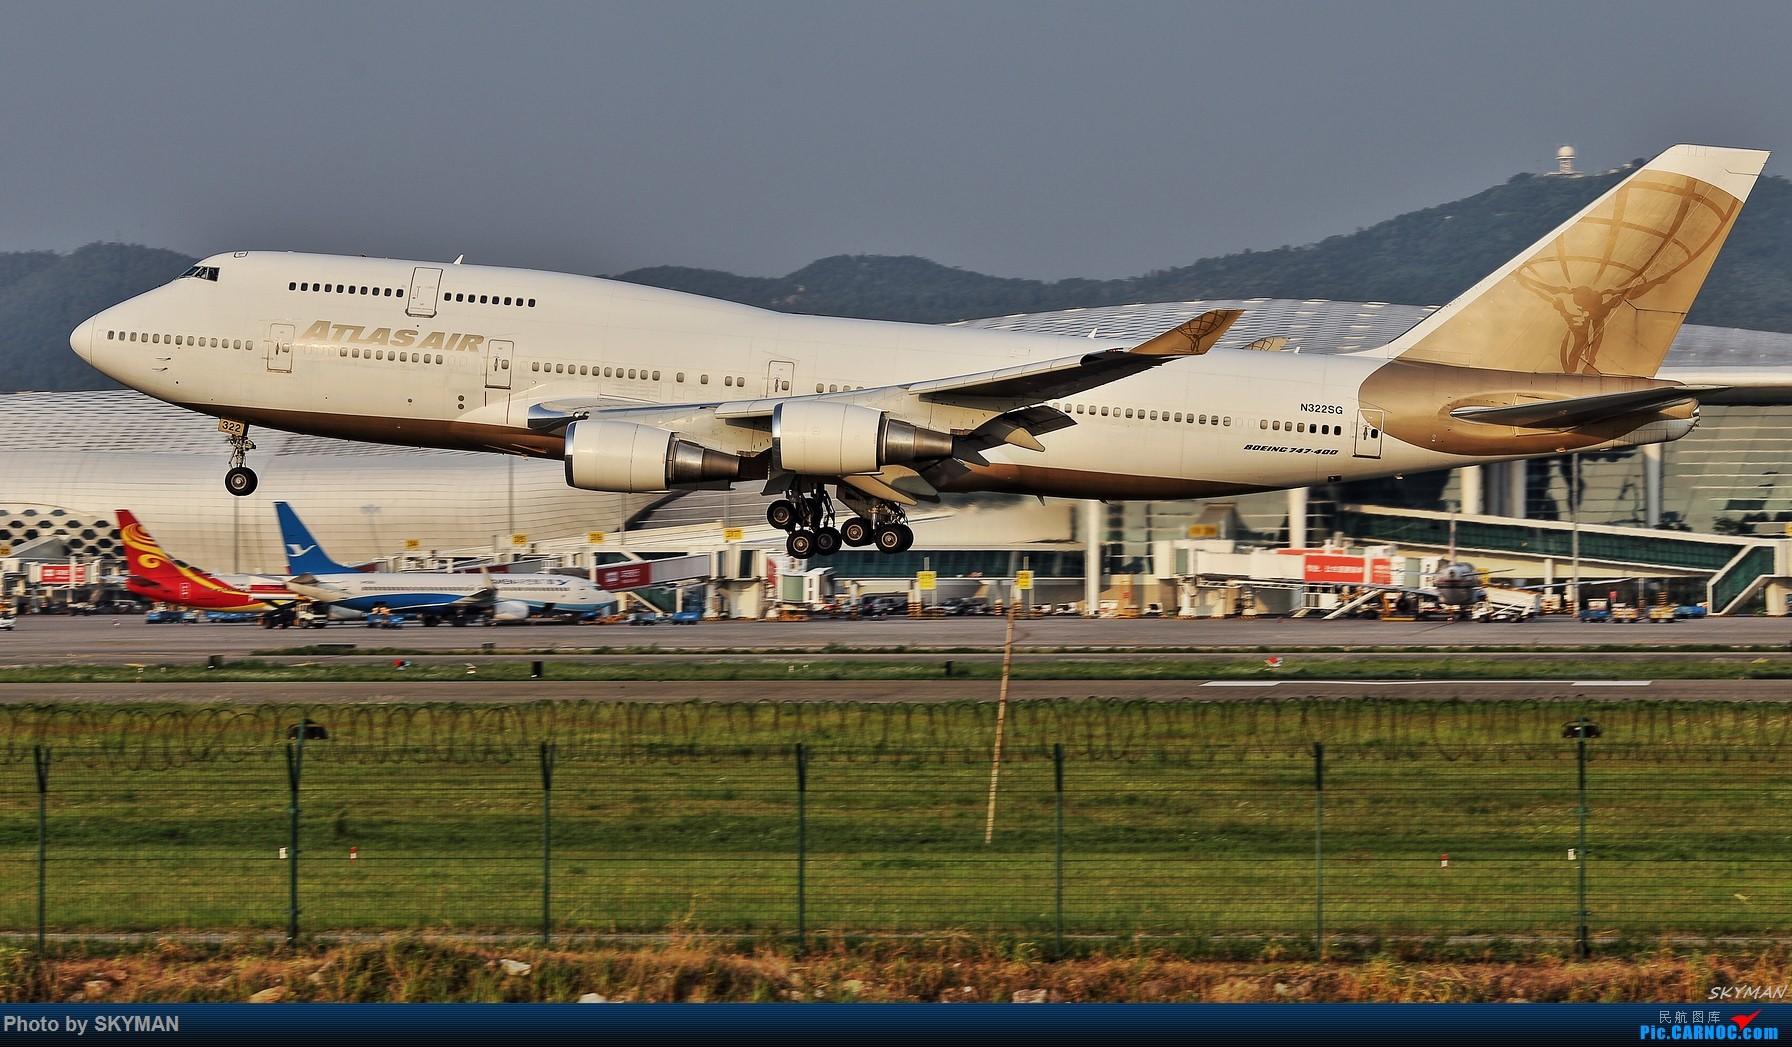 Re:[原创]BLDDQ 关键词:深圳机场 亚特拉斯航空包机 NBA中国 747-400 BOEING 747-400 N322SG 中国深圳宝安国际机场